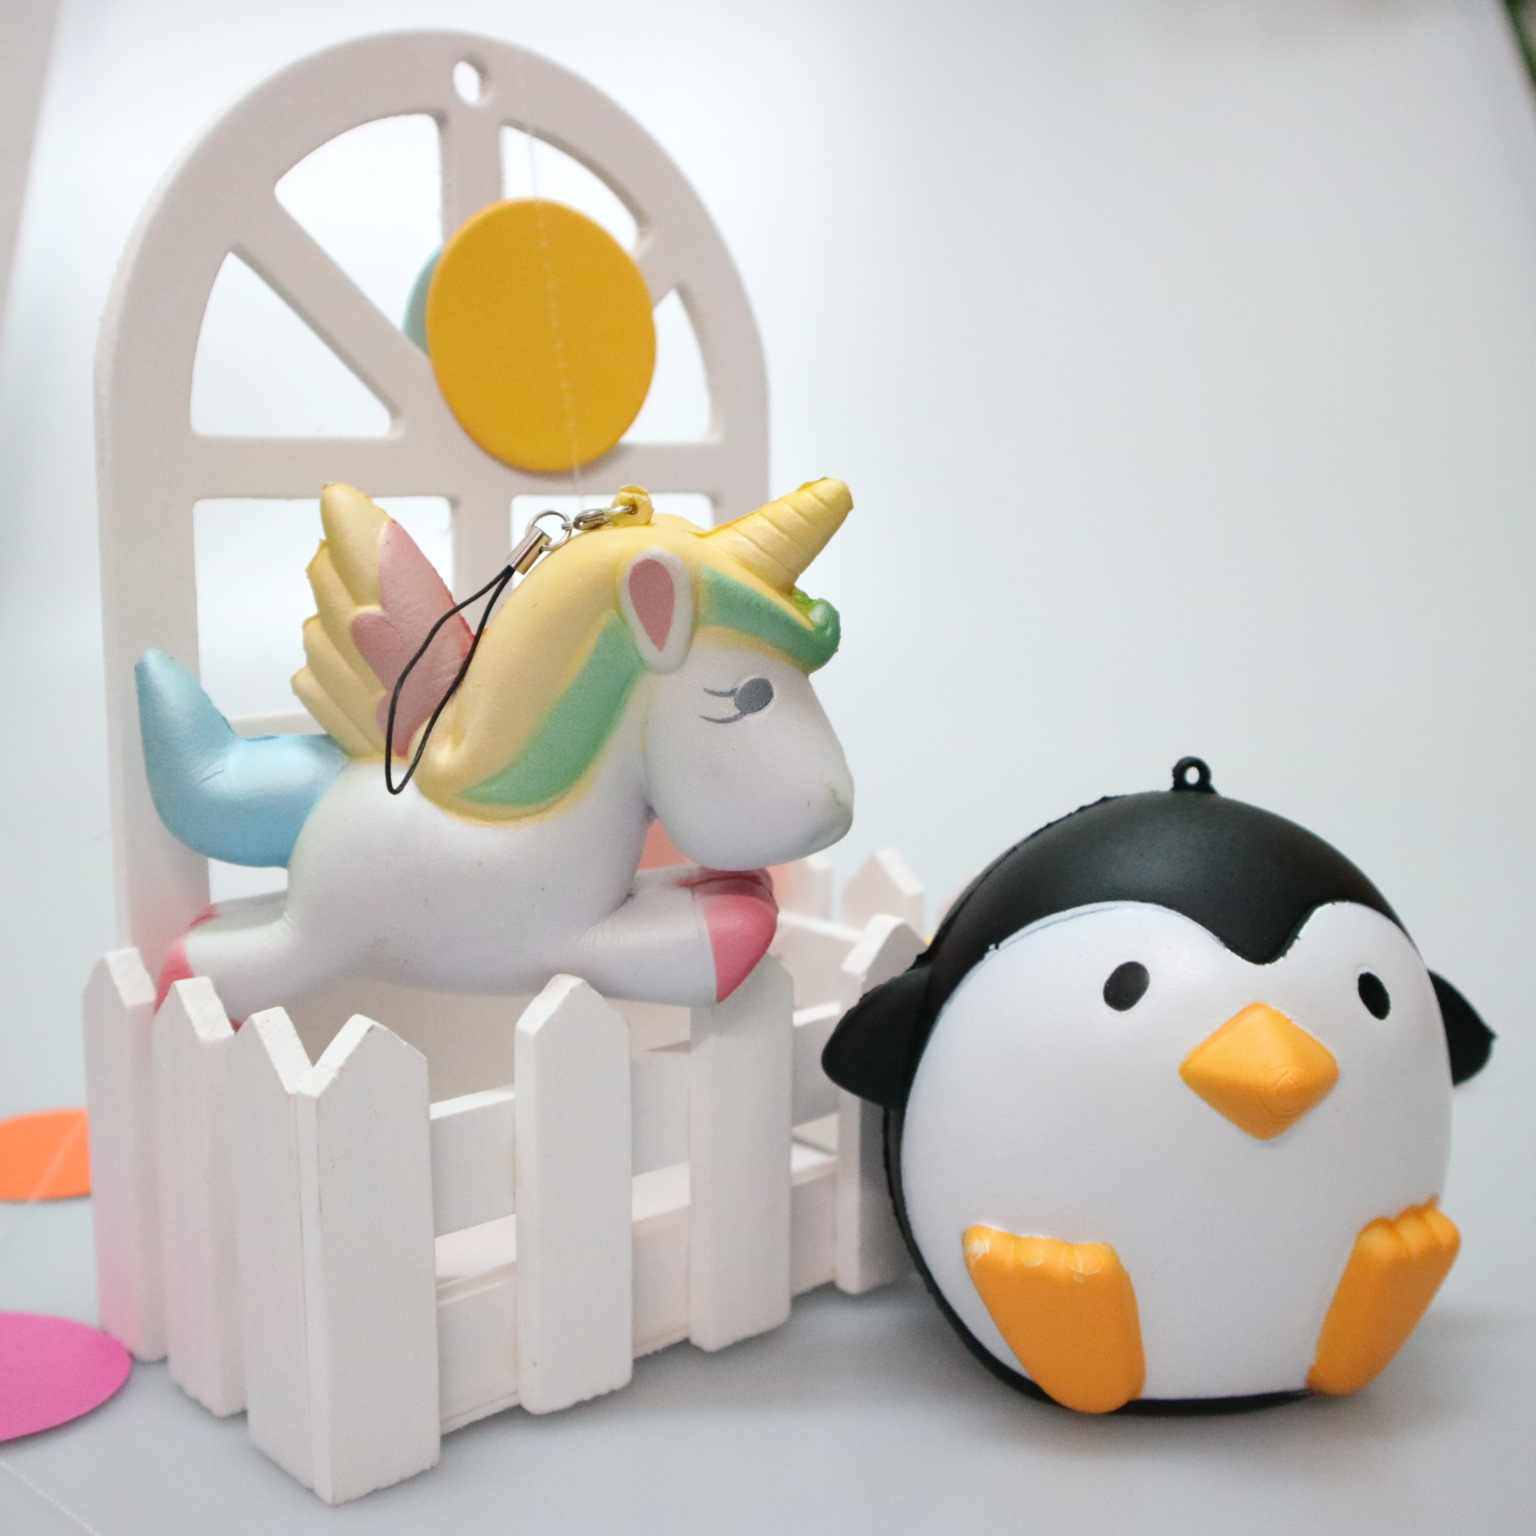 Kawaii Anti-estrés Squishy Mini lindo Pegaso unicornio Panda oso Rana exprimidor lento rebote suave muñeca niños Juguetes regalo